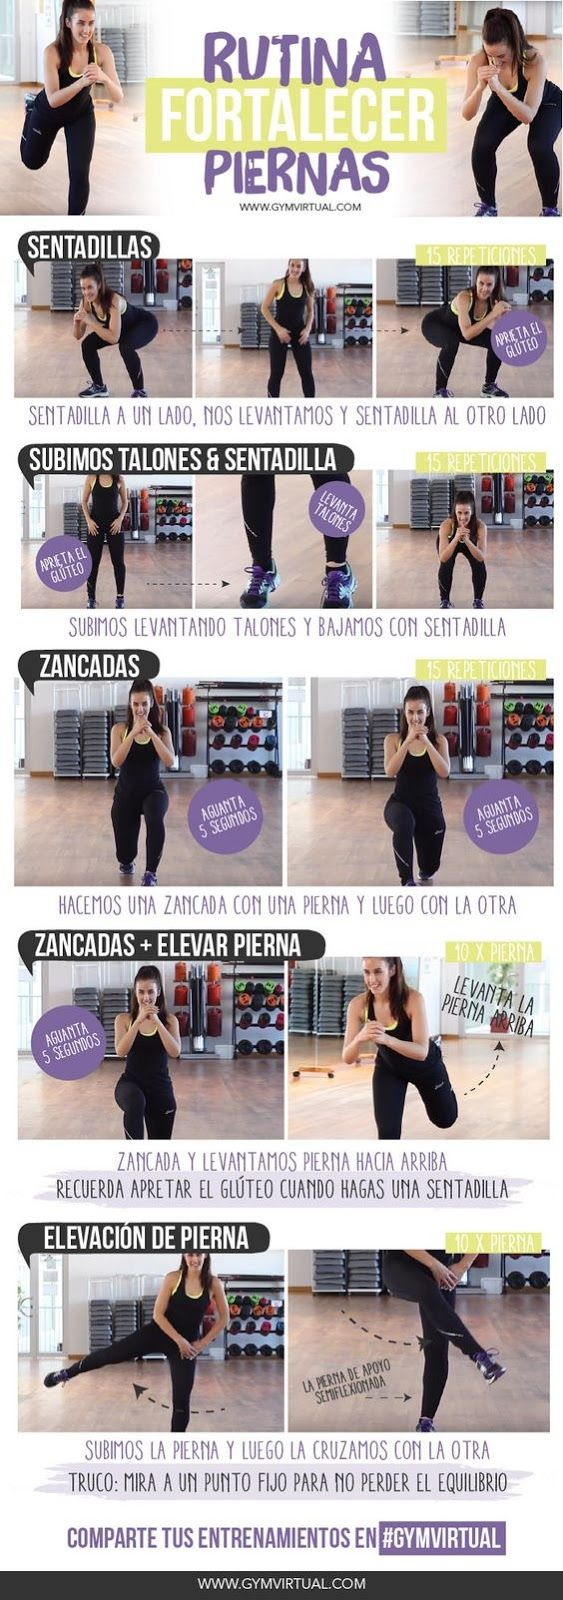 Ejercicios que marcarán la diferencia en tu cuerpo #fitnessbody #womenfitness #womenbeautiful